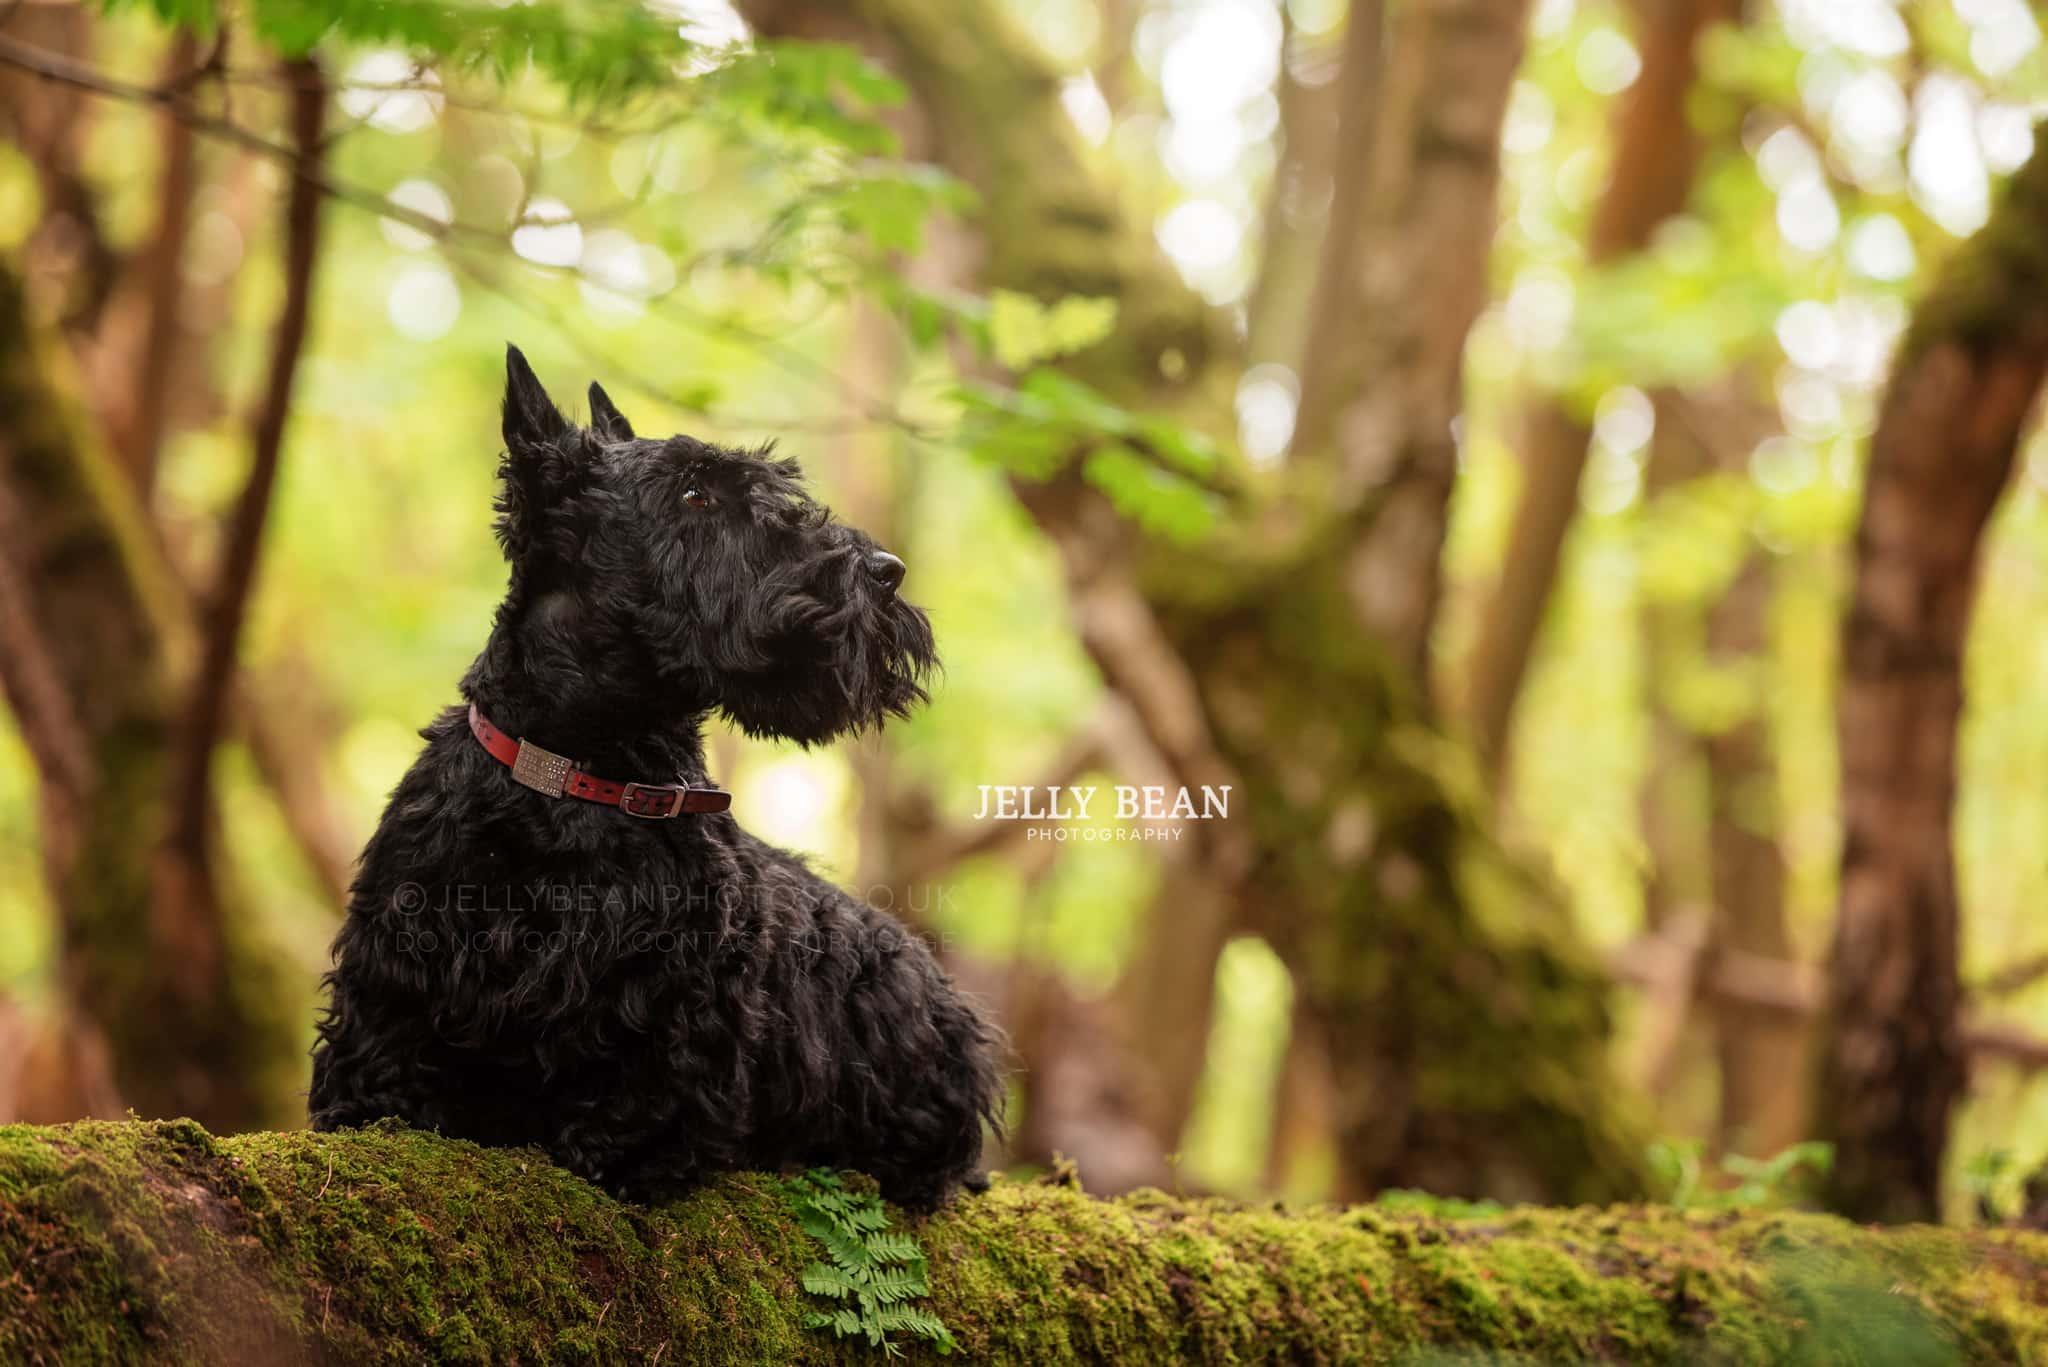 MONICA VAN DER MADEN | DOG PHOTOGRAPHY WORKSHOP